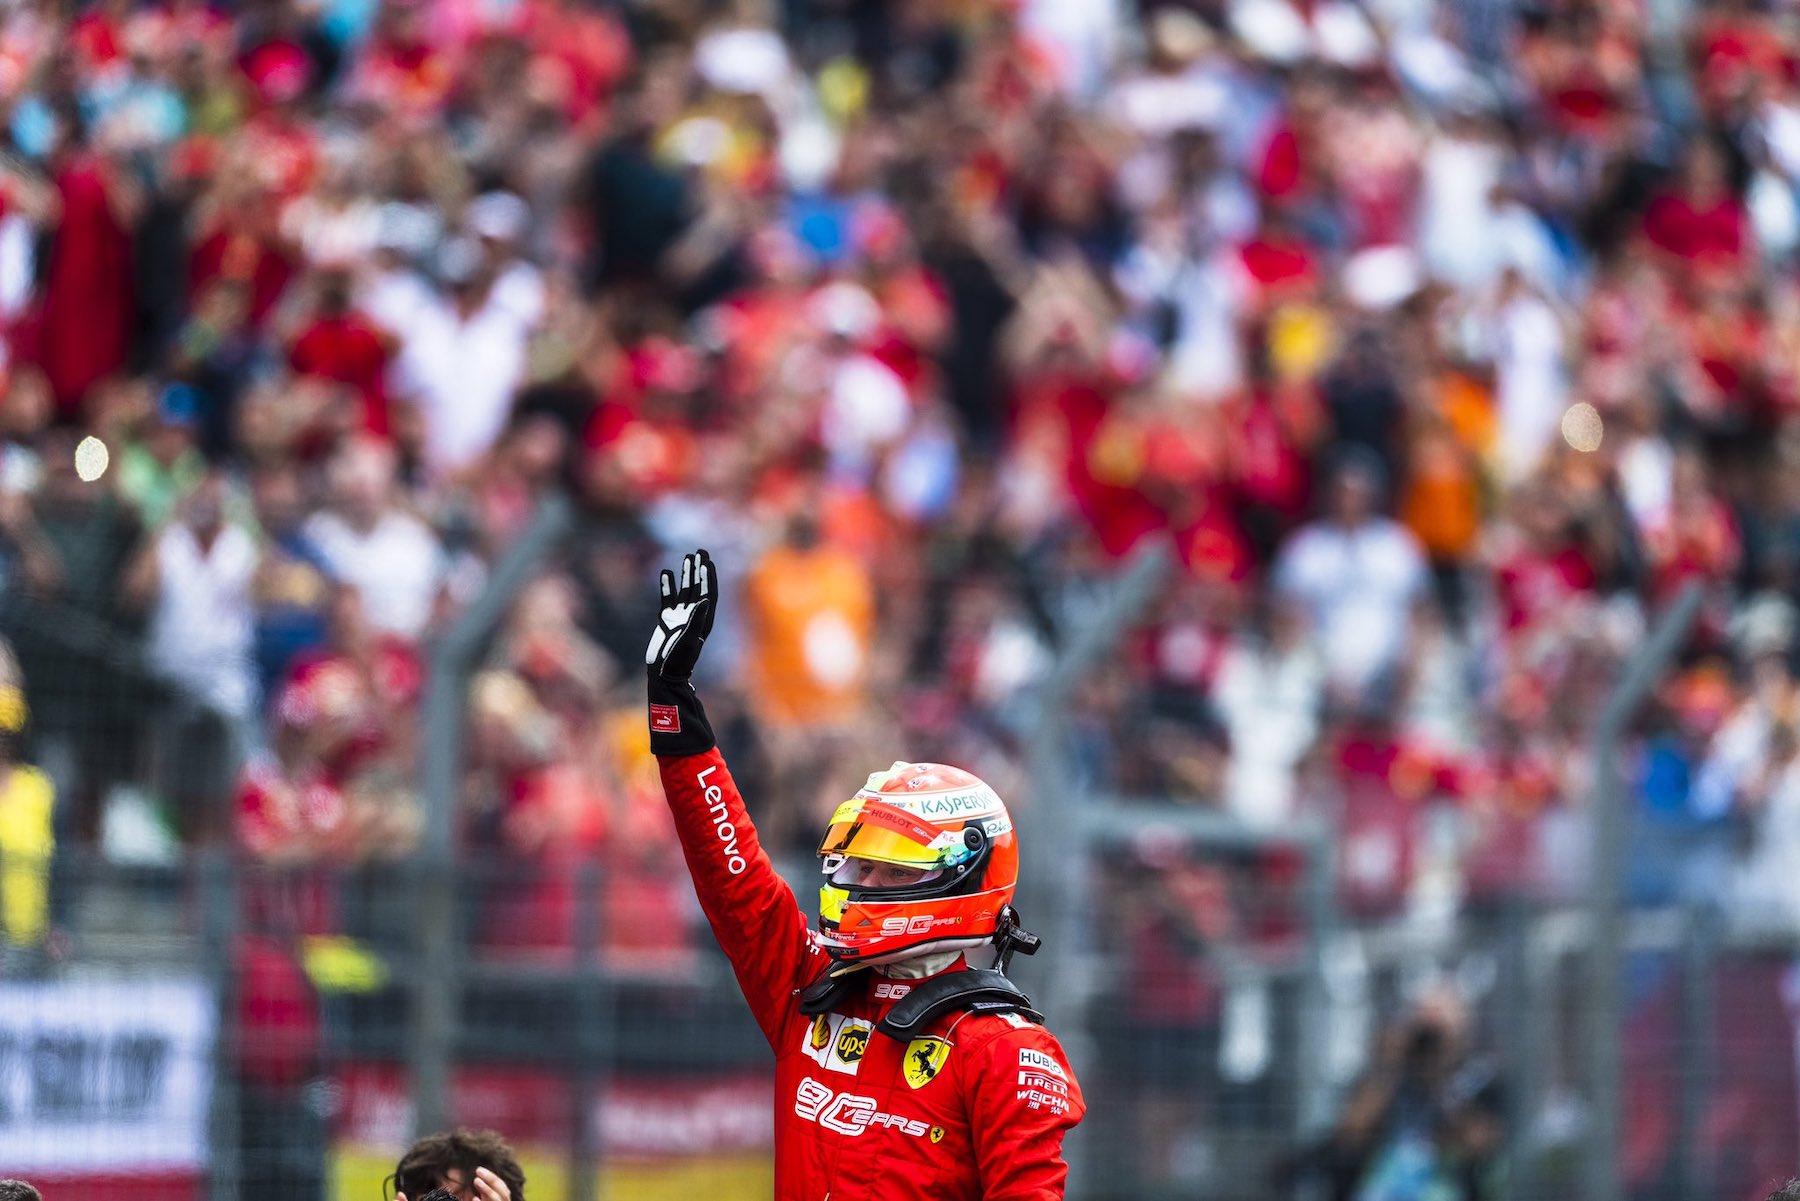 2019 Mick Schumacher | Ferrari F2004 | 2019 German GP 8 copy.jpg